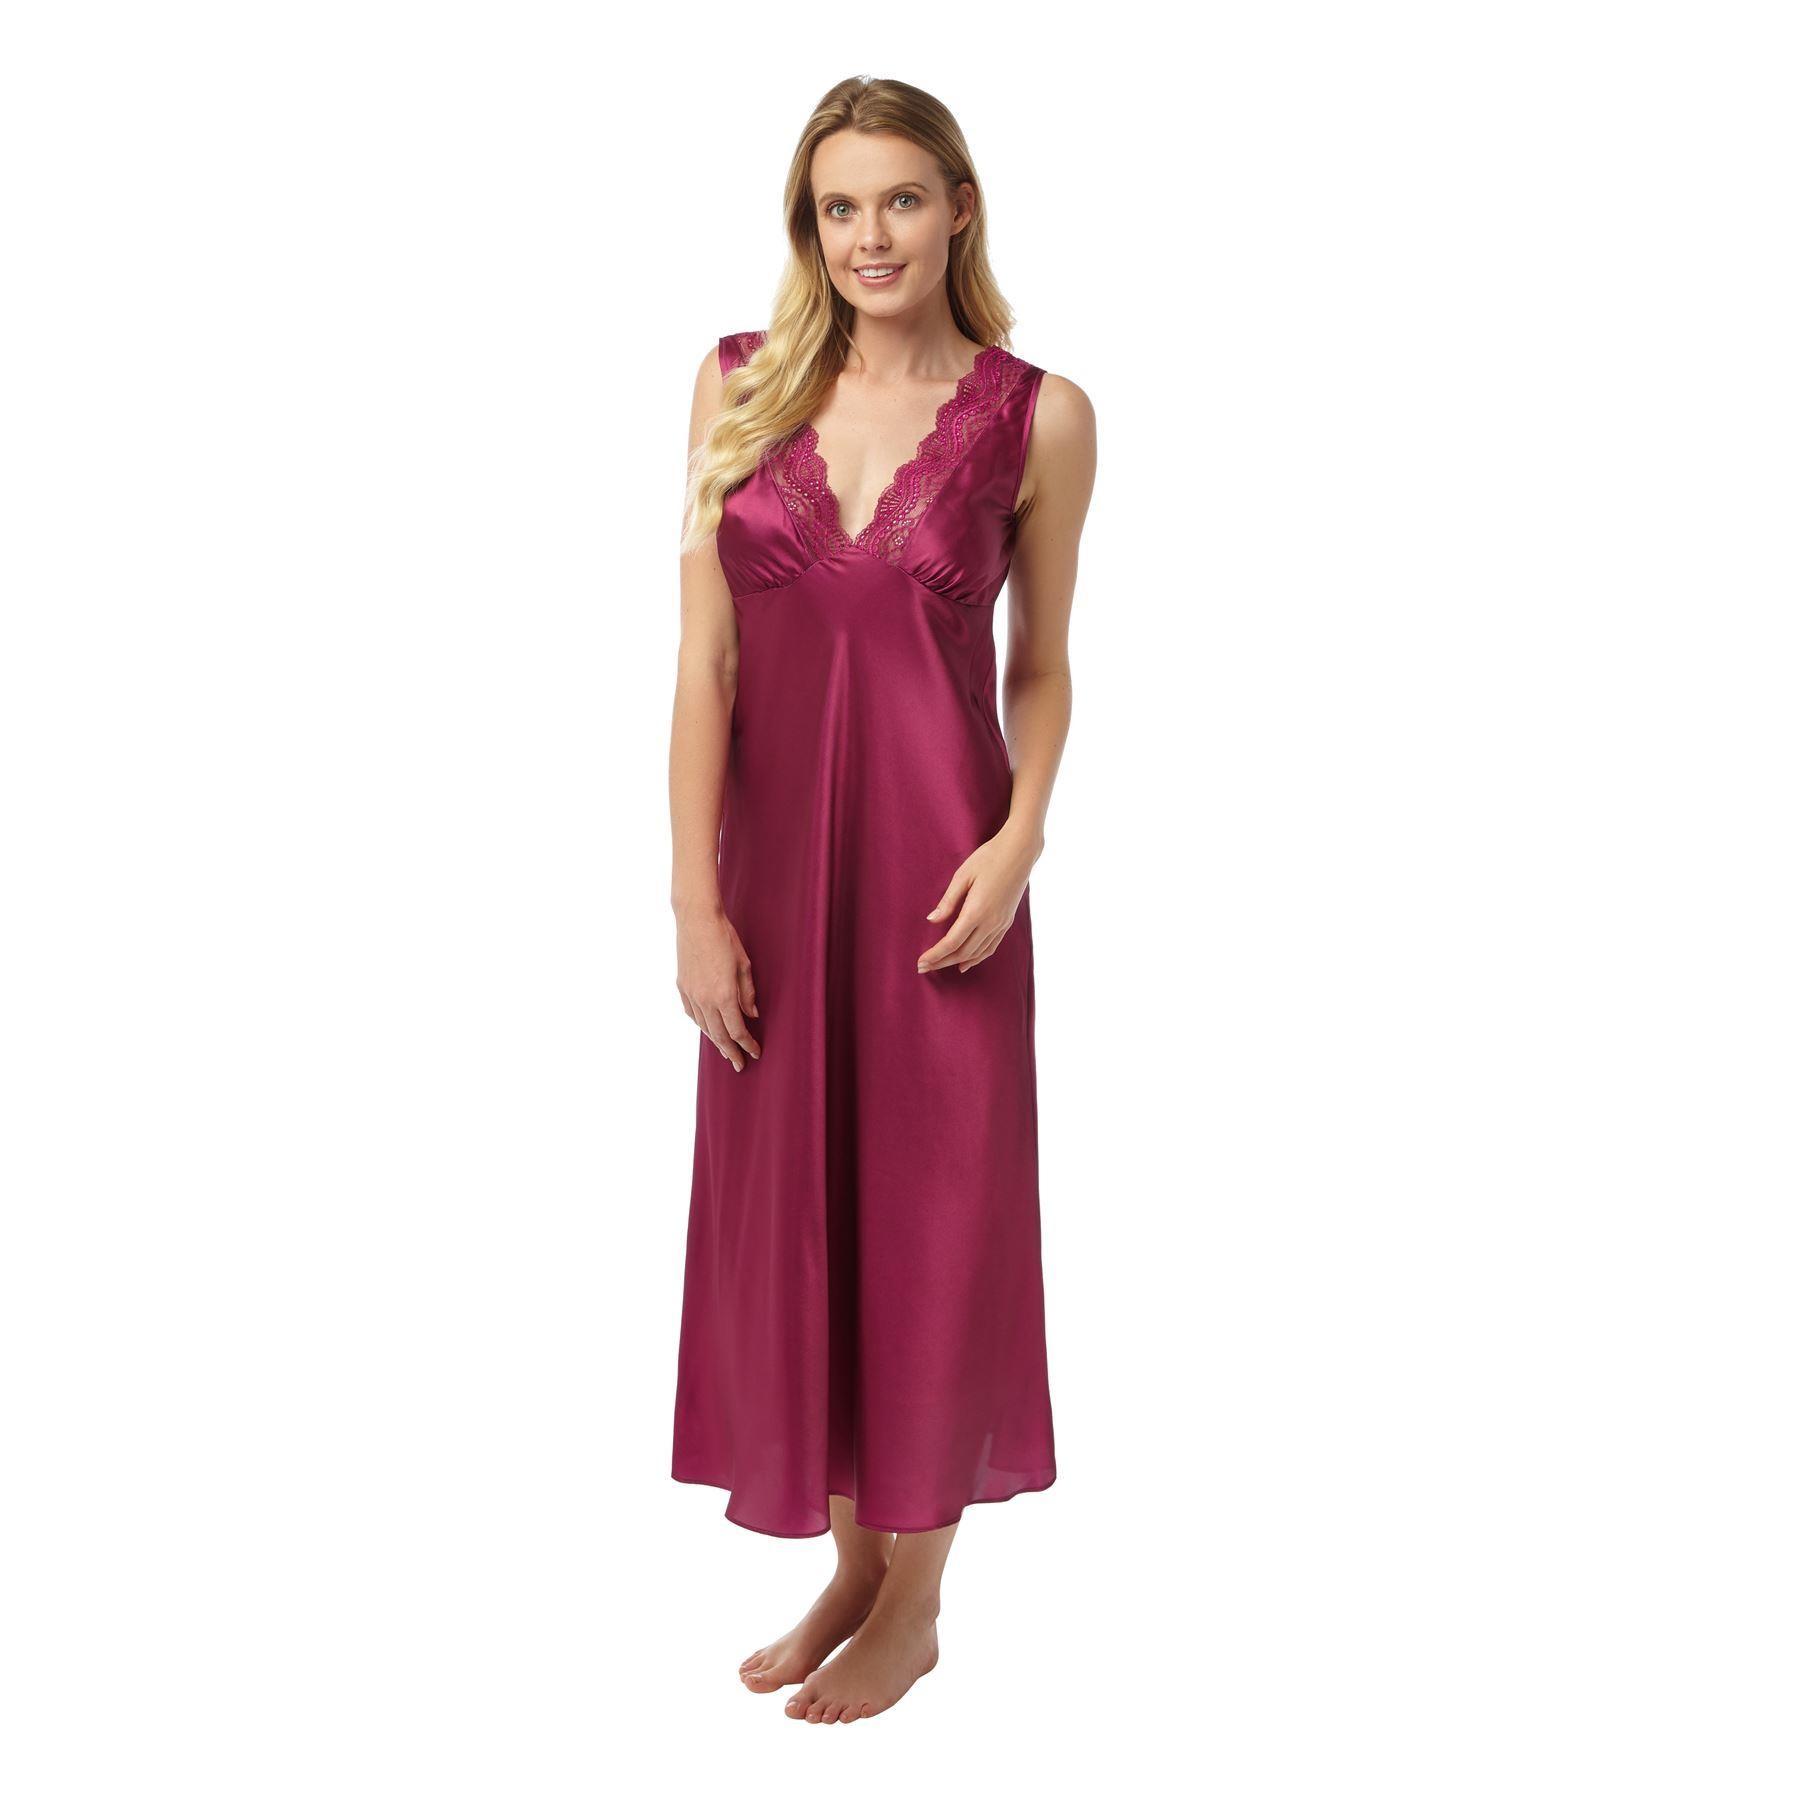 8564c370ebe51 Indigo Sky Ladies Long Satin Nightdress - Grape | Free UK Delivery |  KnickersBoxersGlory